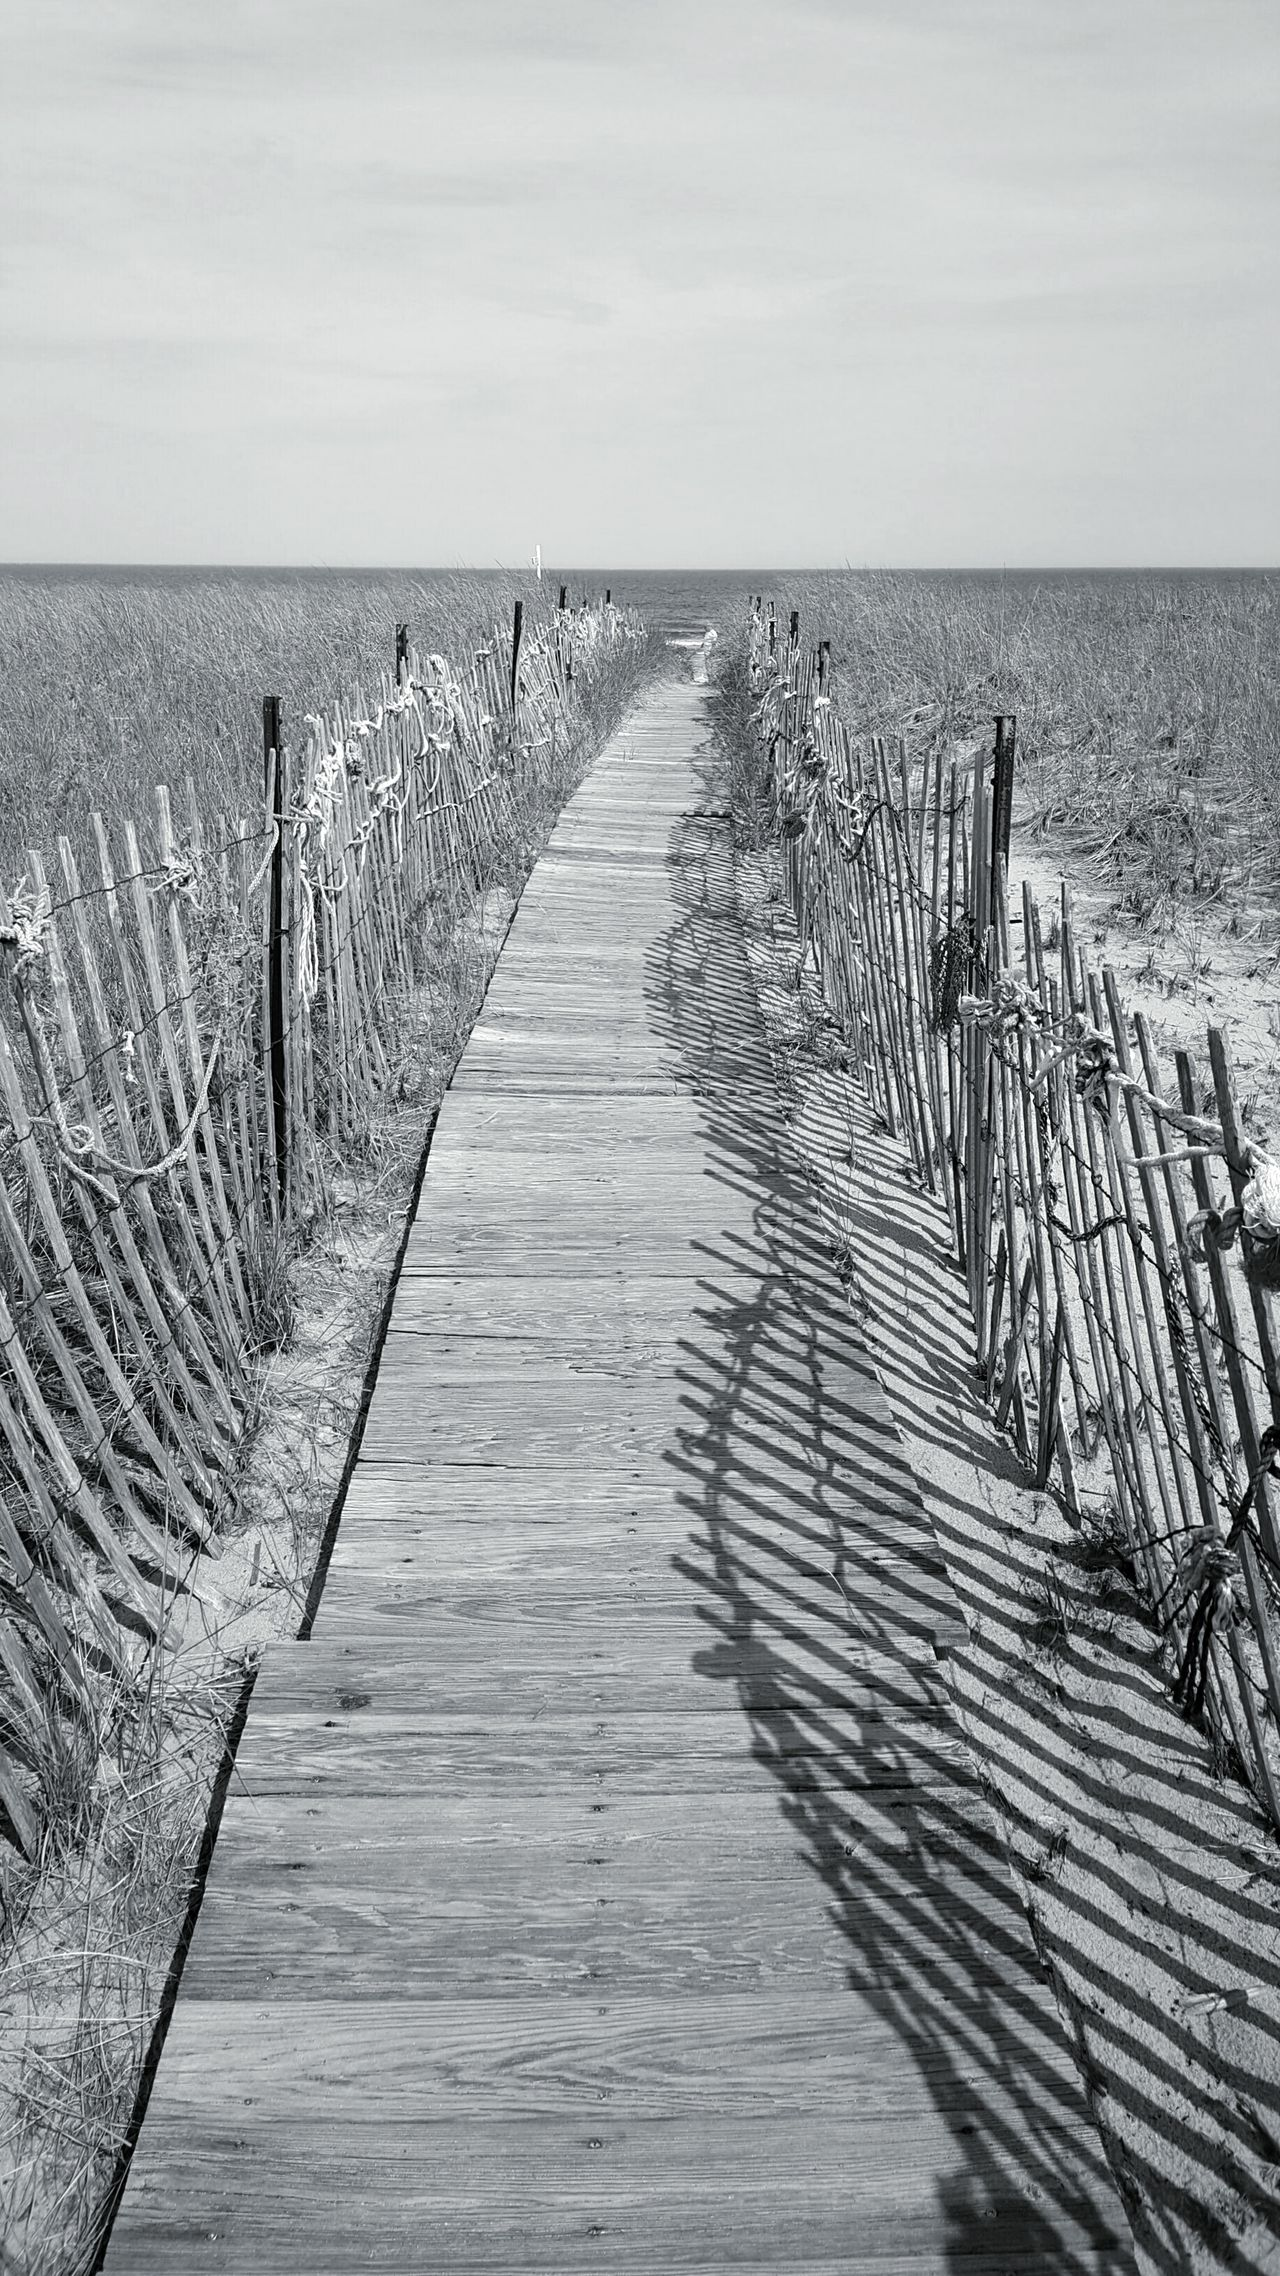 Casco Beach Access Beach Walk Opme⛱ EyeEm Gallery Eyeemphotography EyeEm Shawdows Sea And Sand Keep Off Dunes! EyeEm Best Shots - Black + White S6 Monochrome Photography Maine Photography 🌲